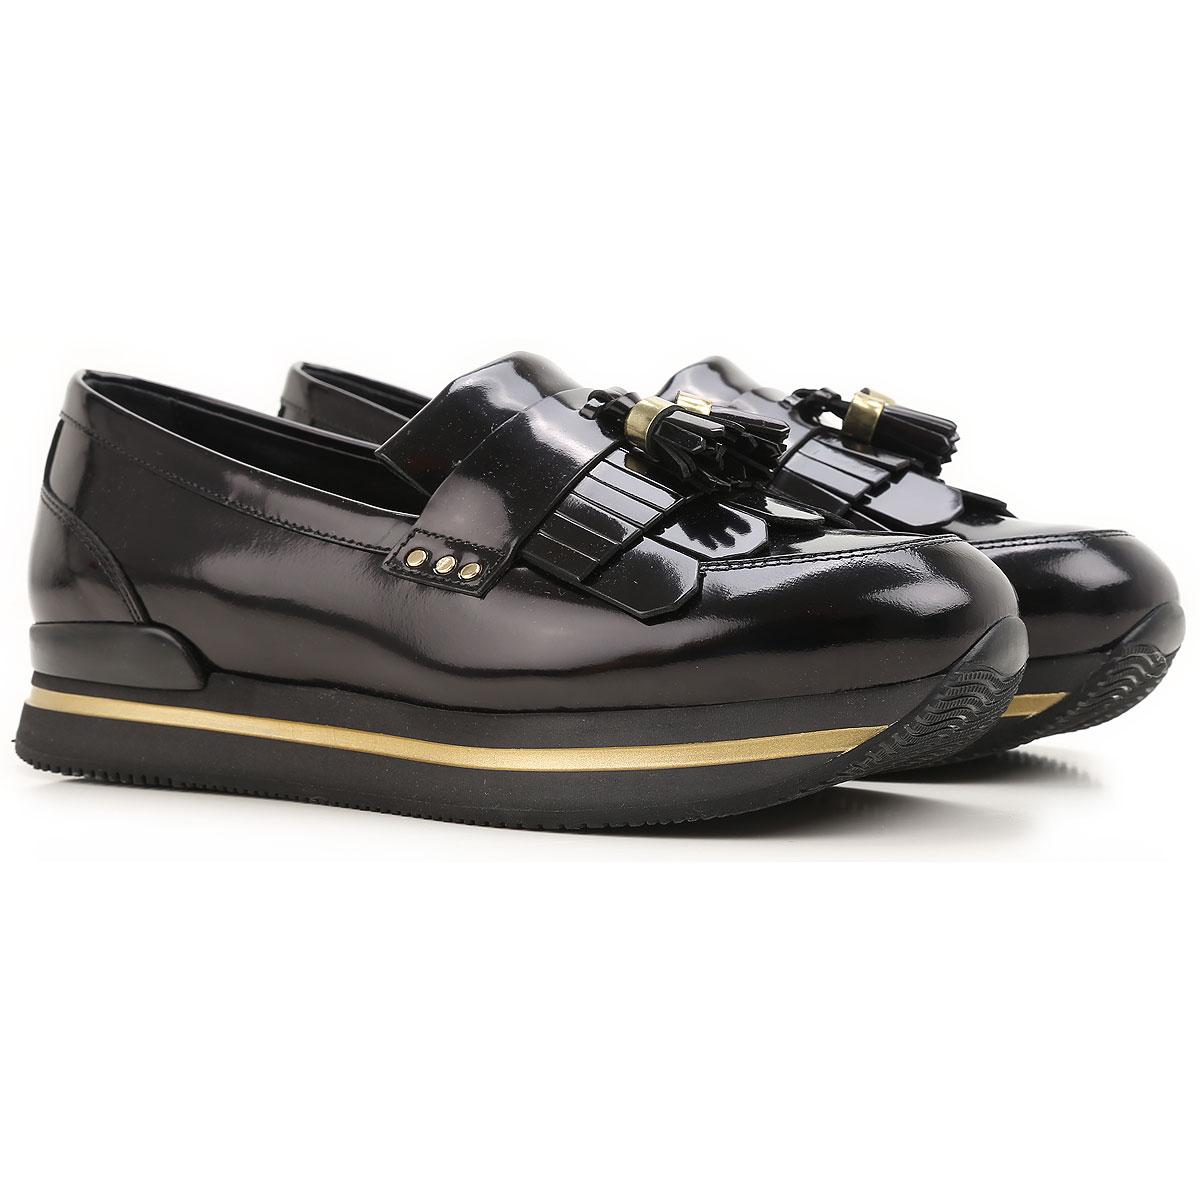 Womens Shoes Hogan Style code hxw2220v6306wn0510 376879